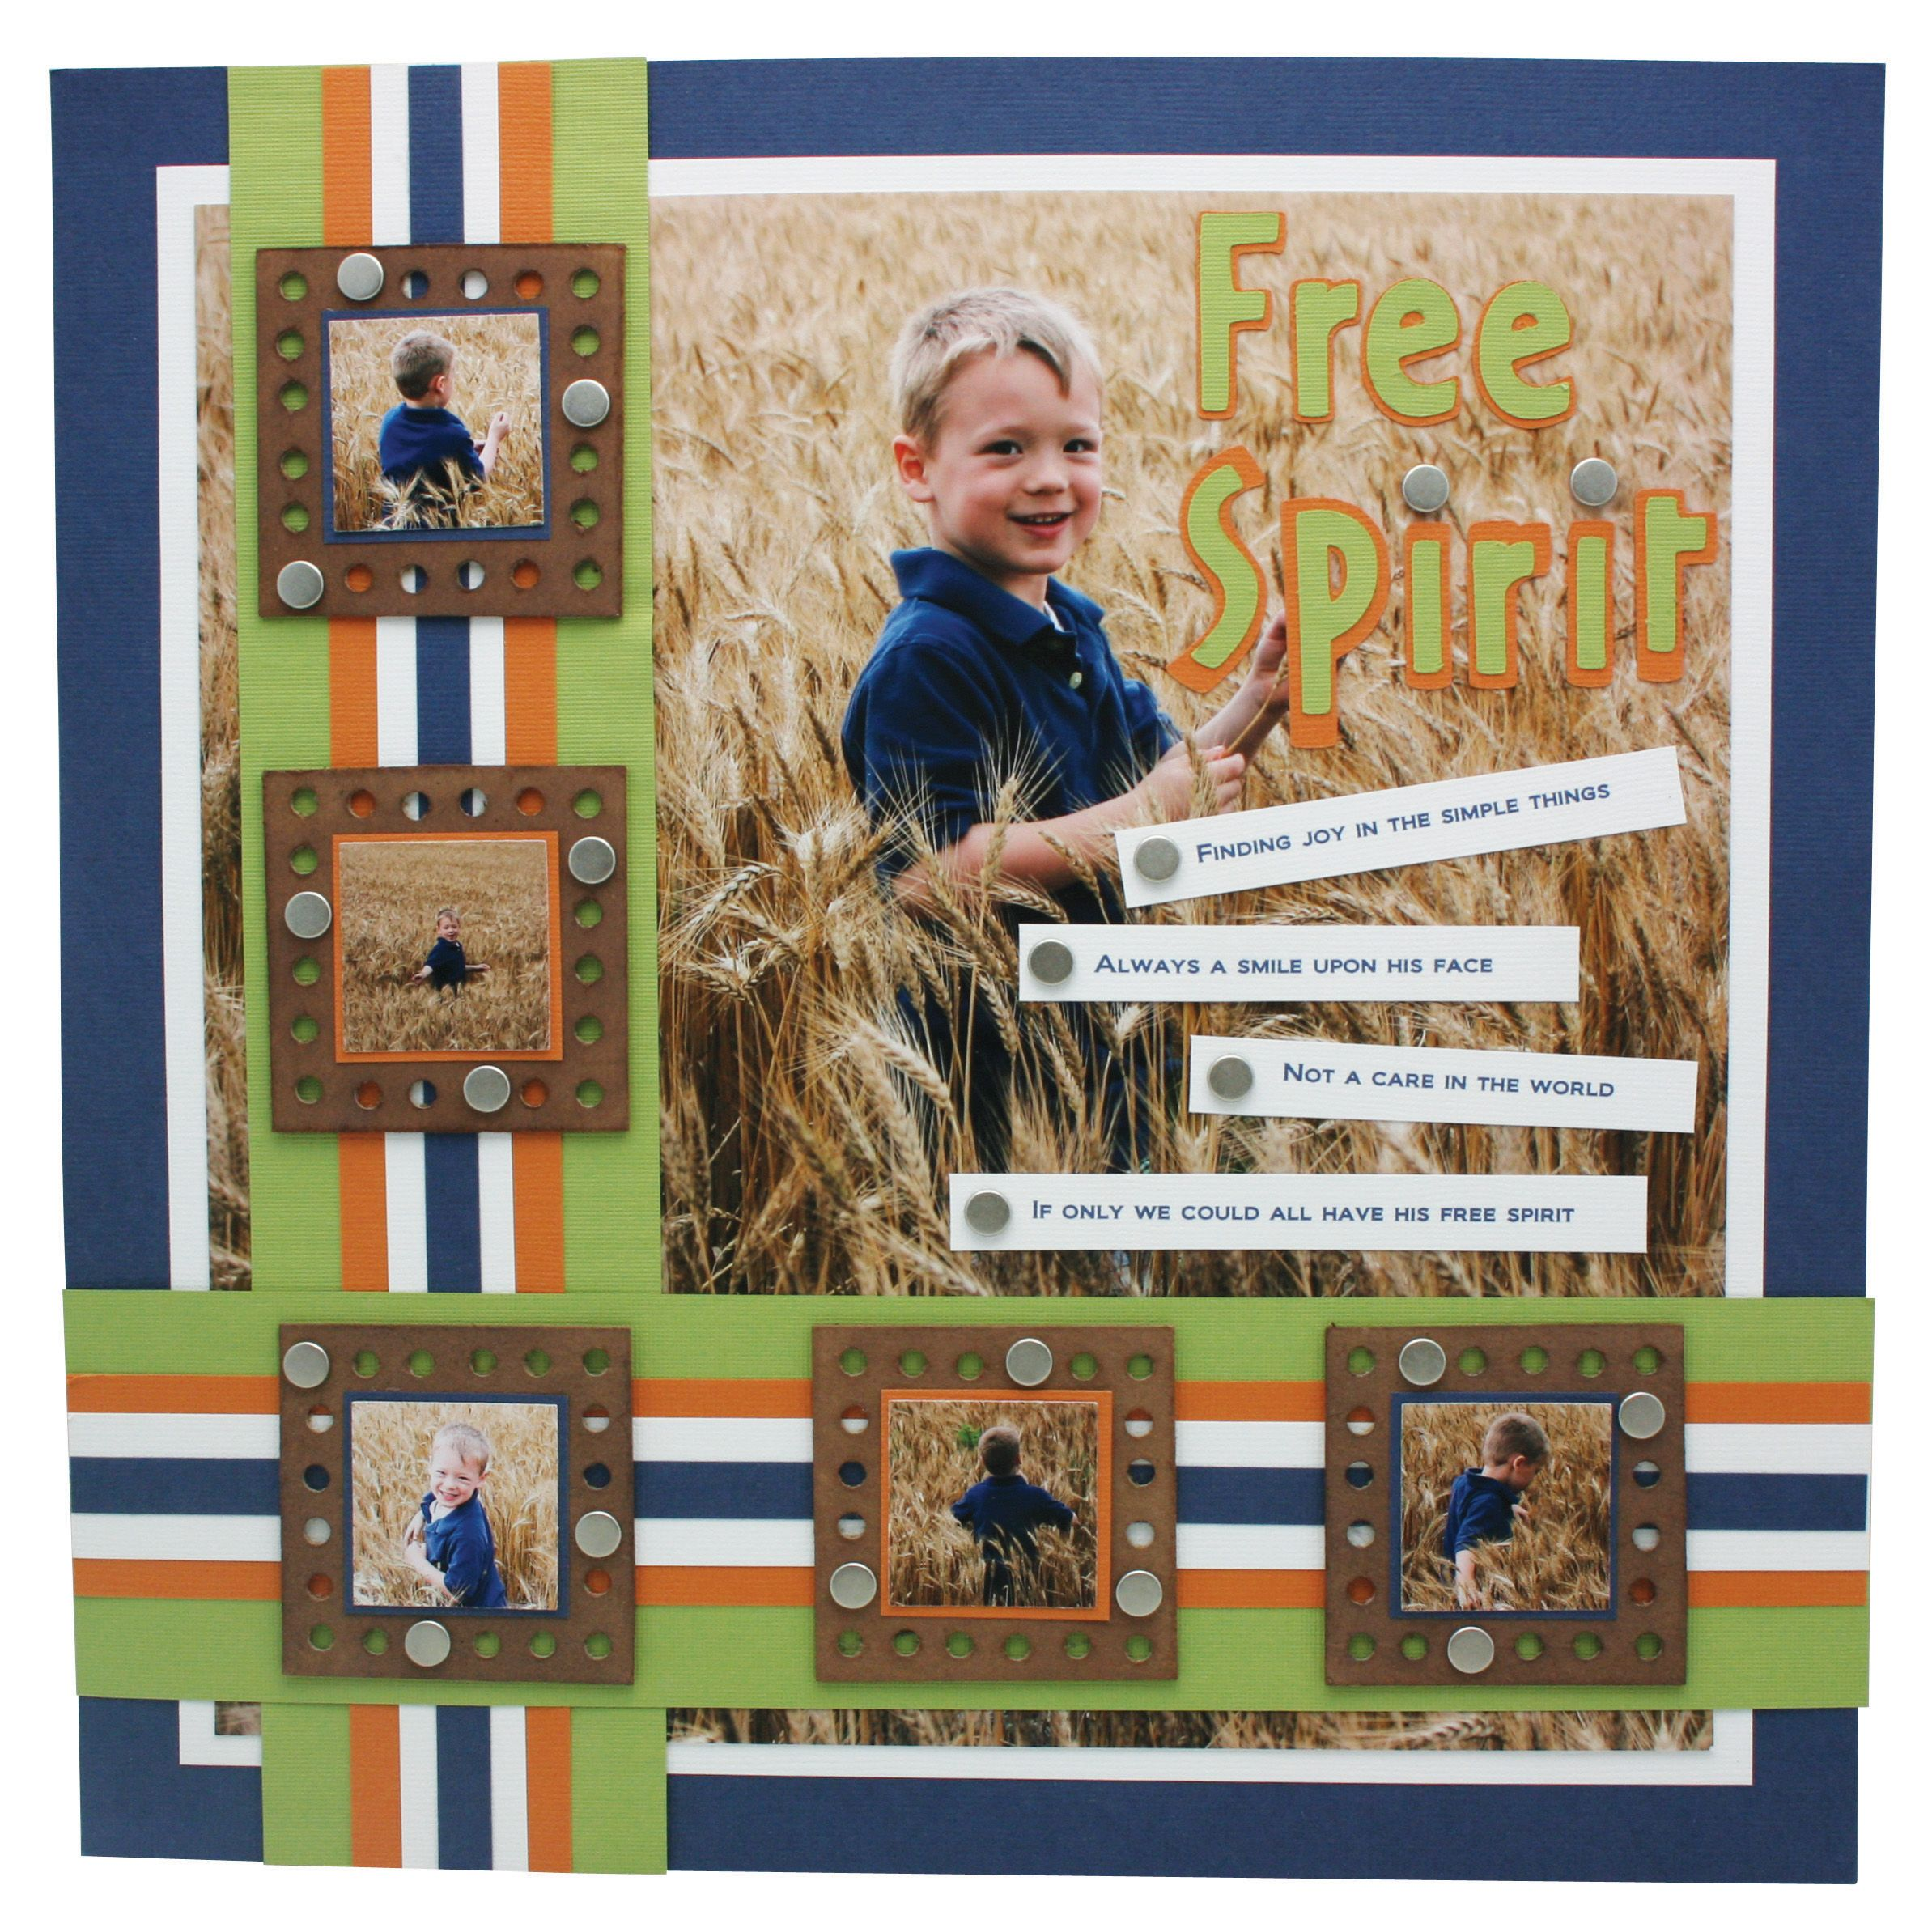 Scrapbook ideas layouts free - Tools hand punch free spirit layout jpg 2 387 2 387 pixels